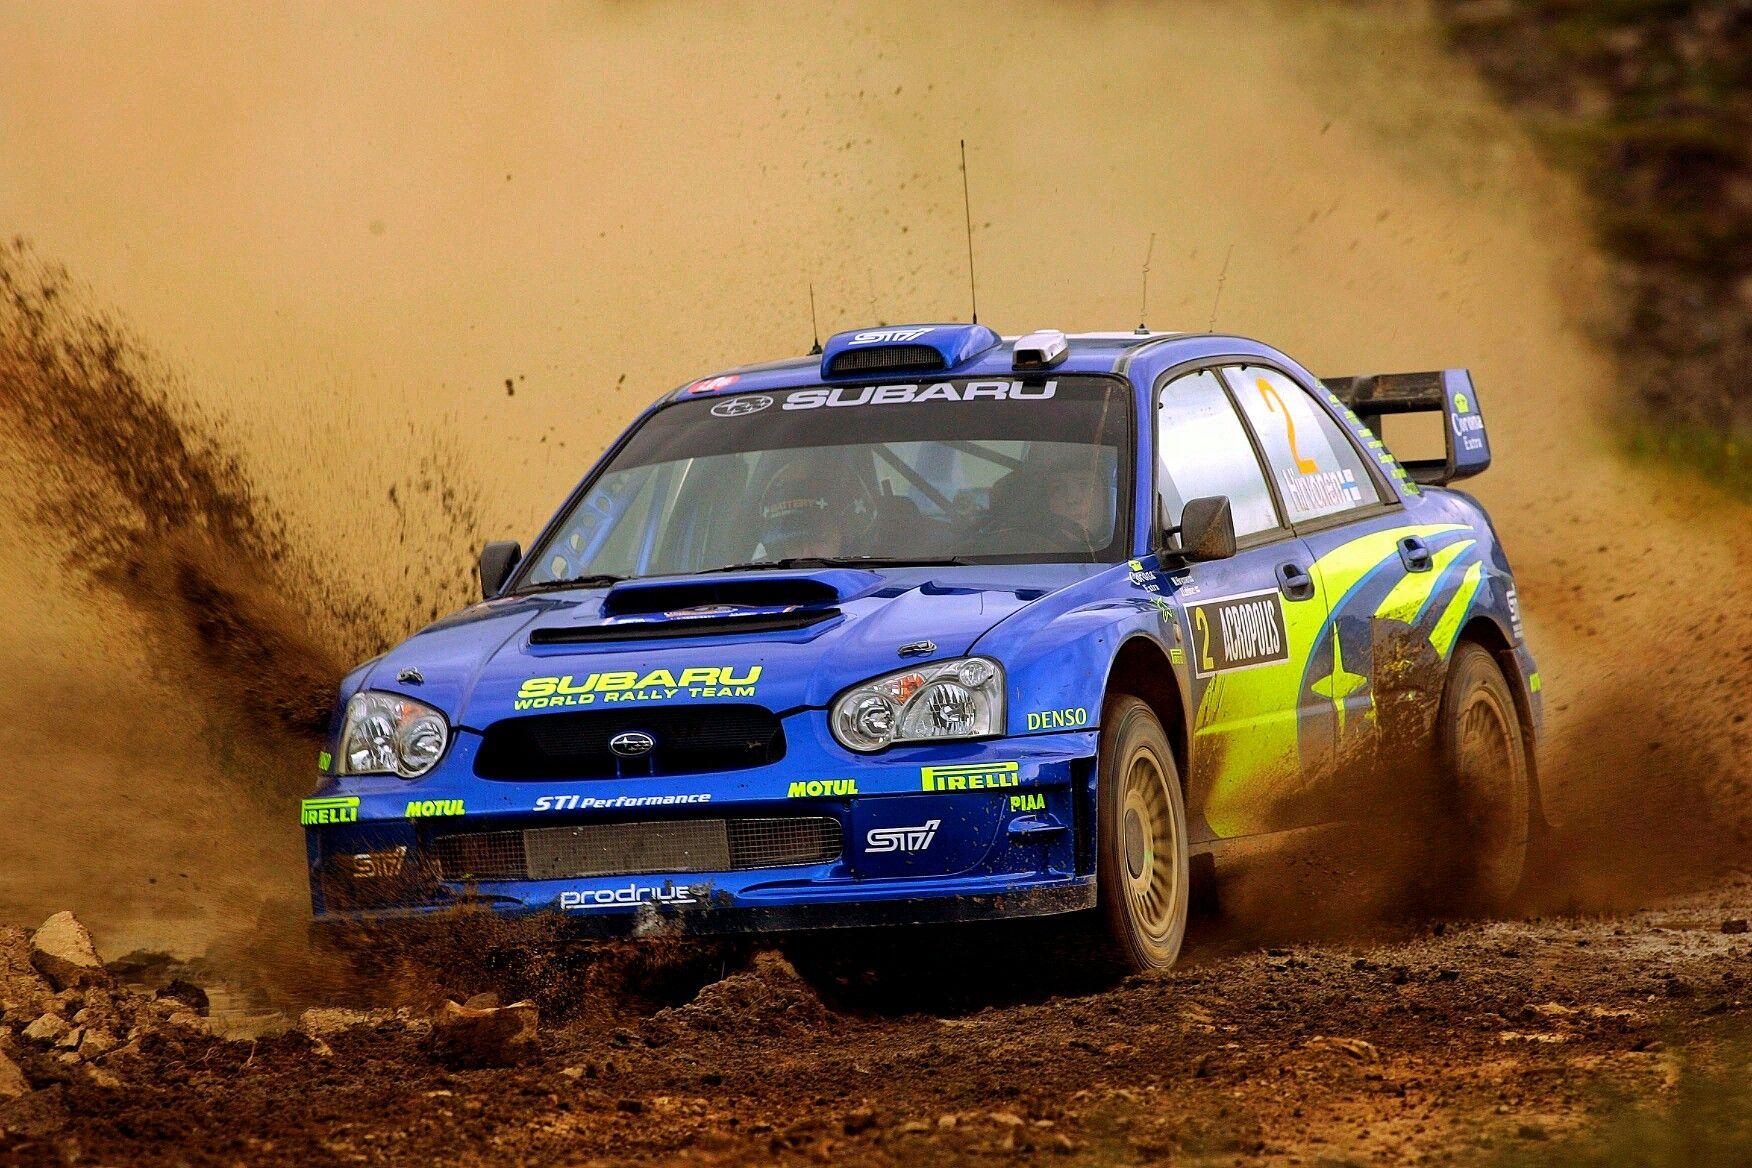 2019 Wrc Subaru Is Bringing Back The Classic Blue Comet Theme Which Is What Many Folks Consider The Quin Subaru Impreza Wrc Subaru Rally Rally Car Design